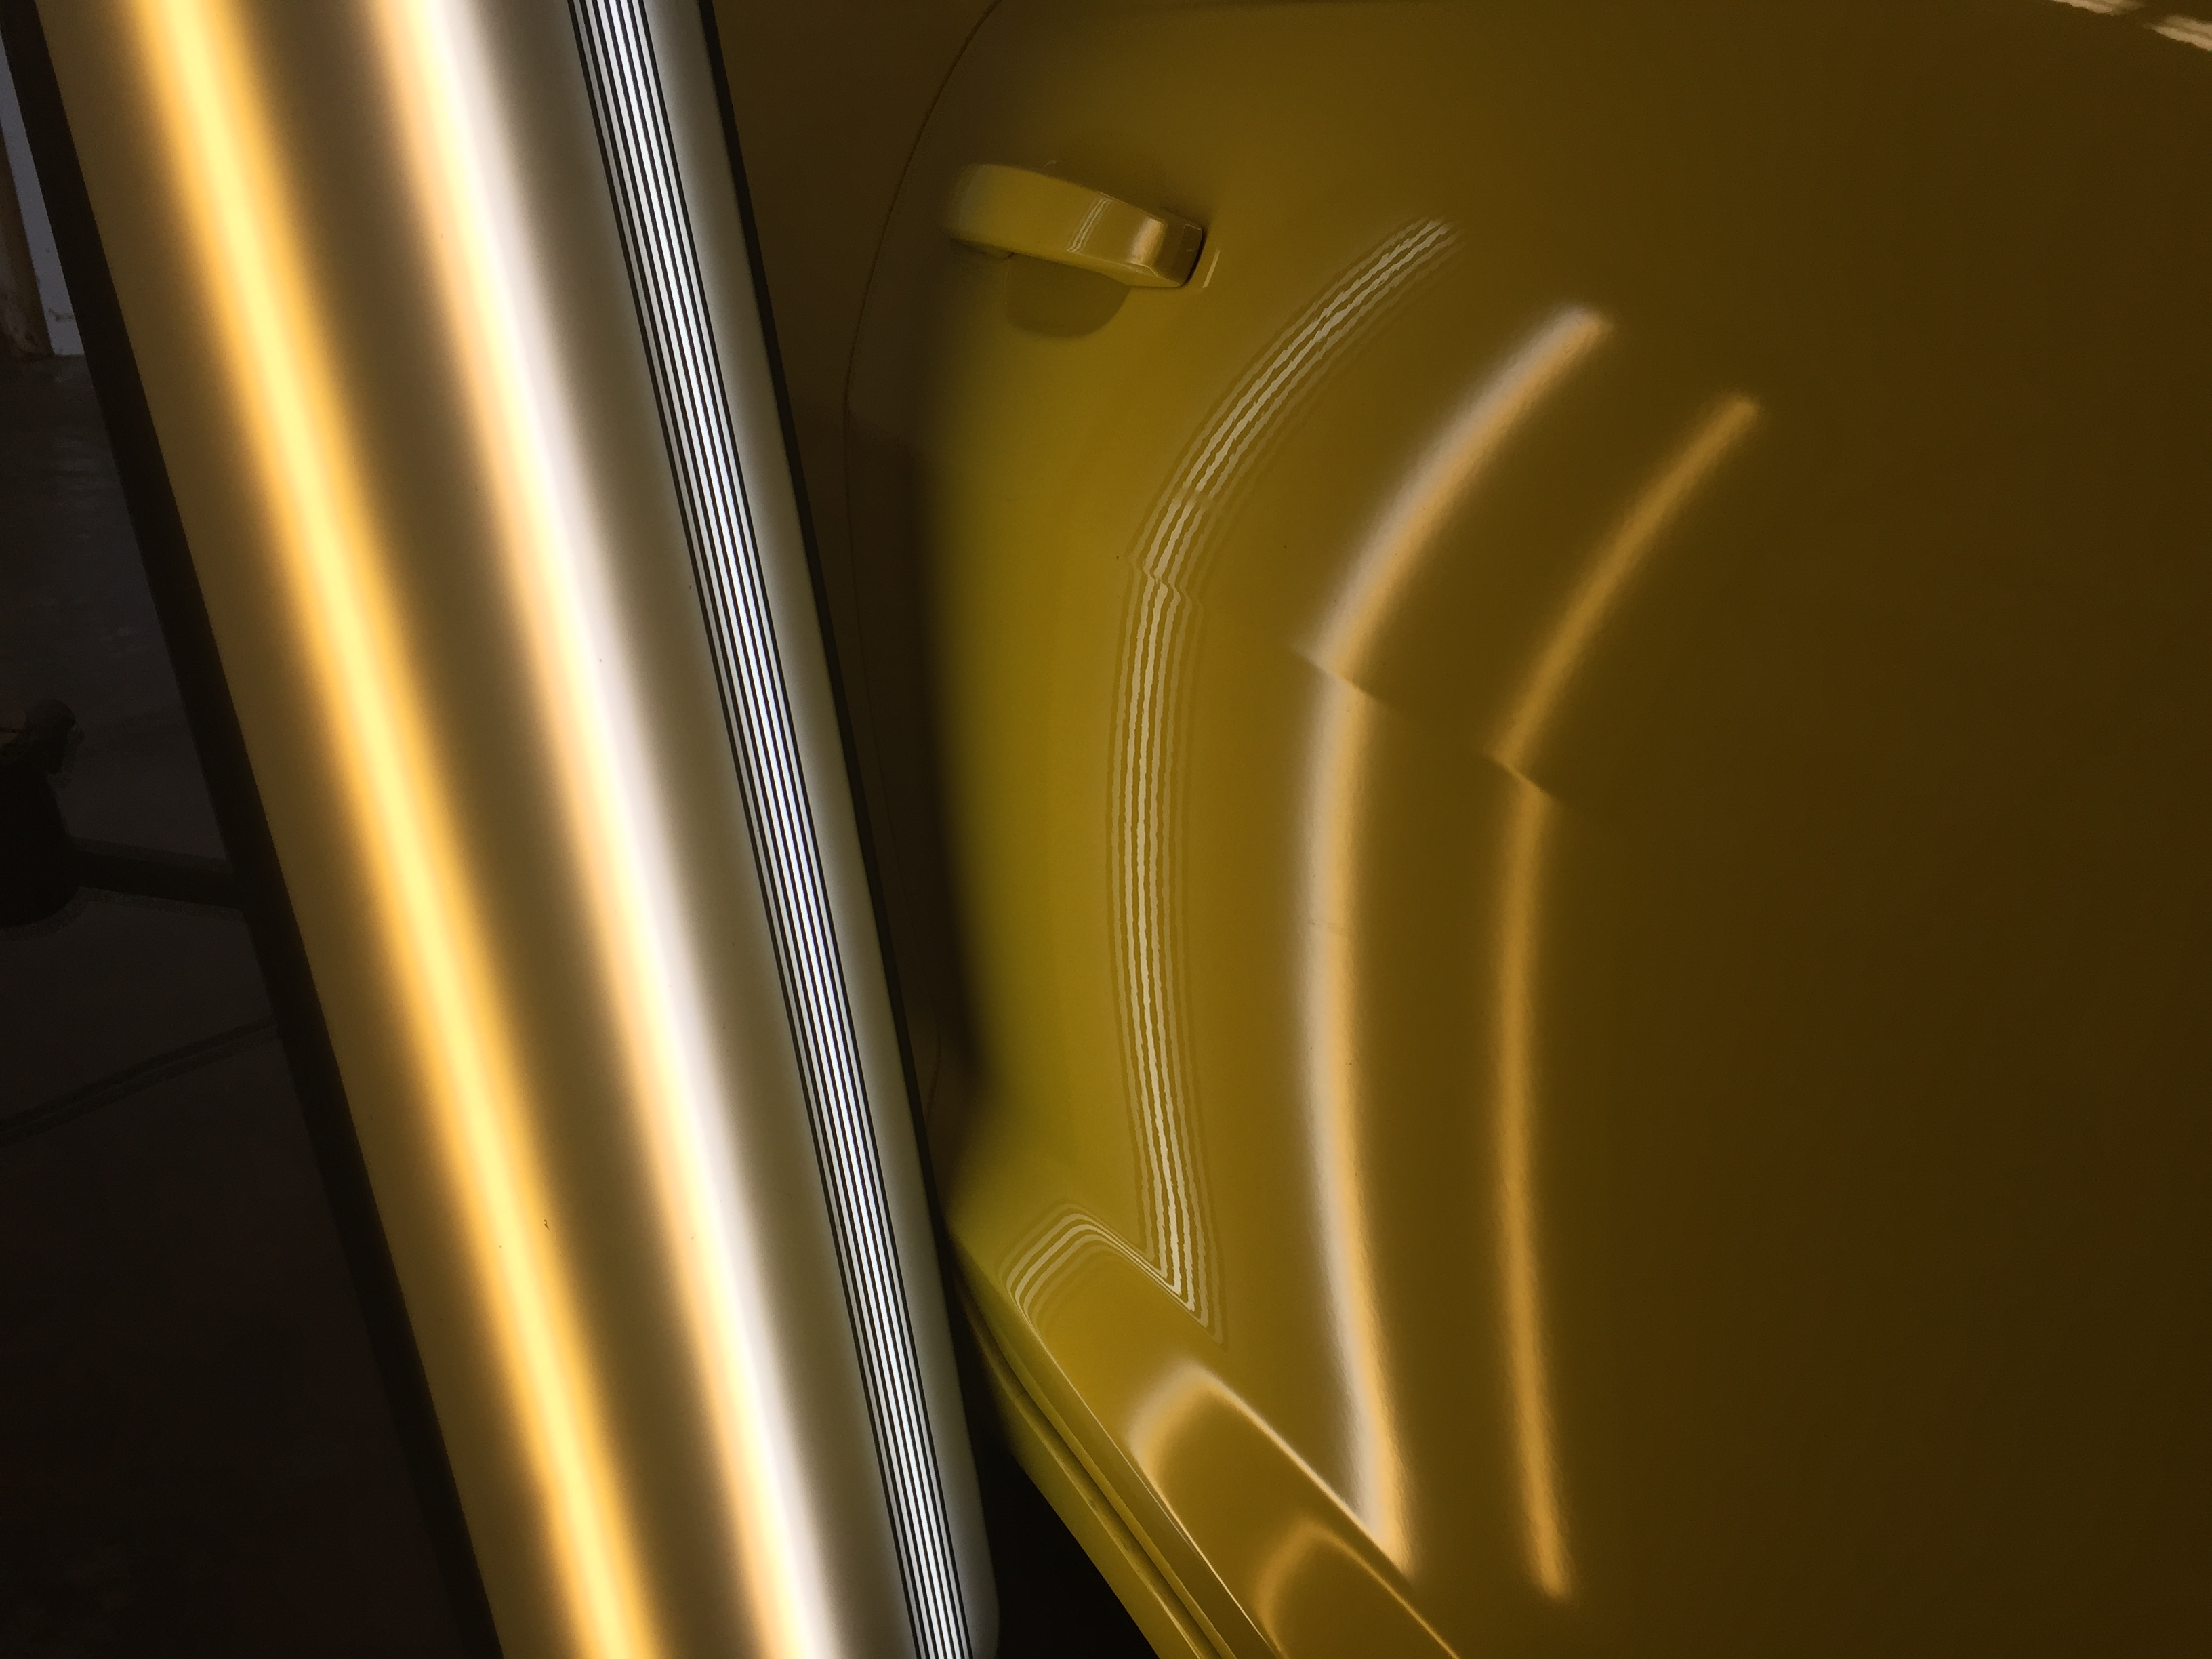 Http://217dent.com, Mobile Dent Repair, 2015 Camero, Dent on Passenger Door Body Line, Paintless Dent Repair, Springfield IL